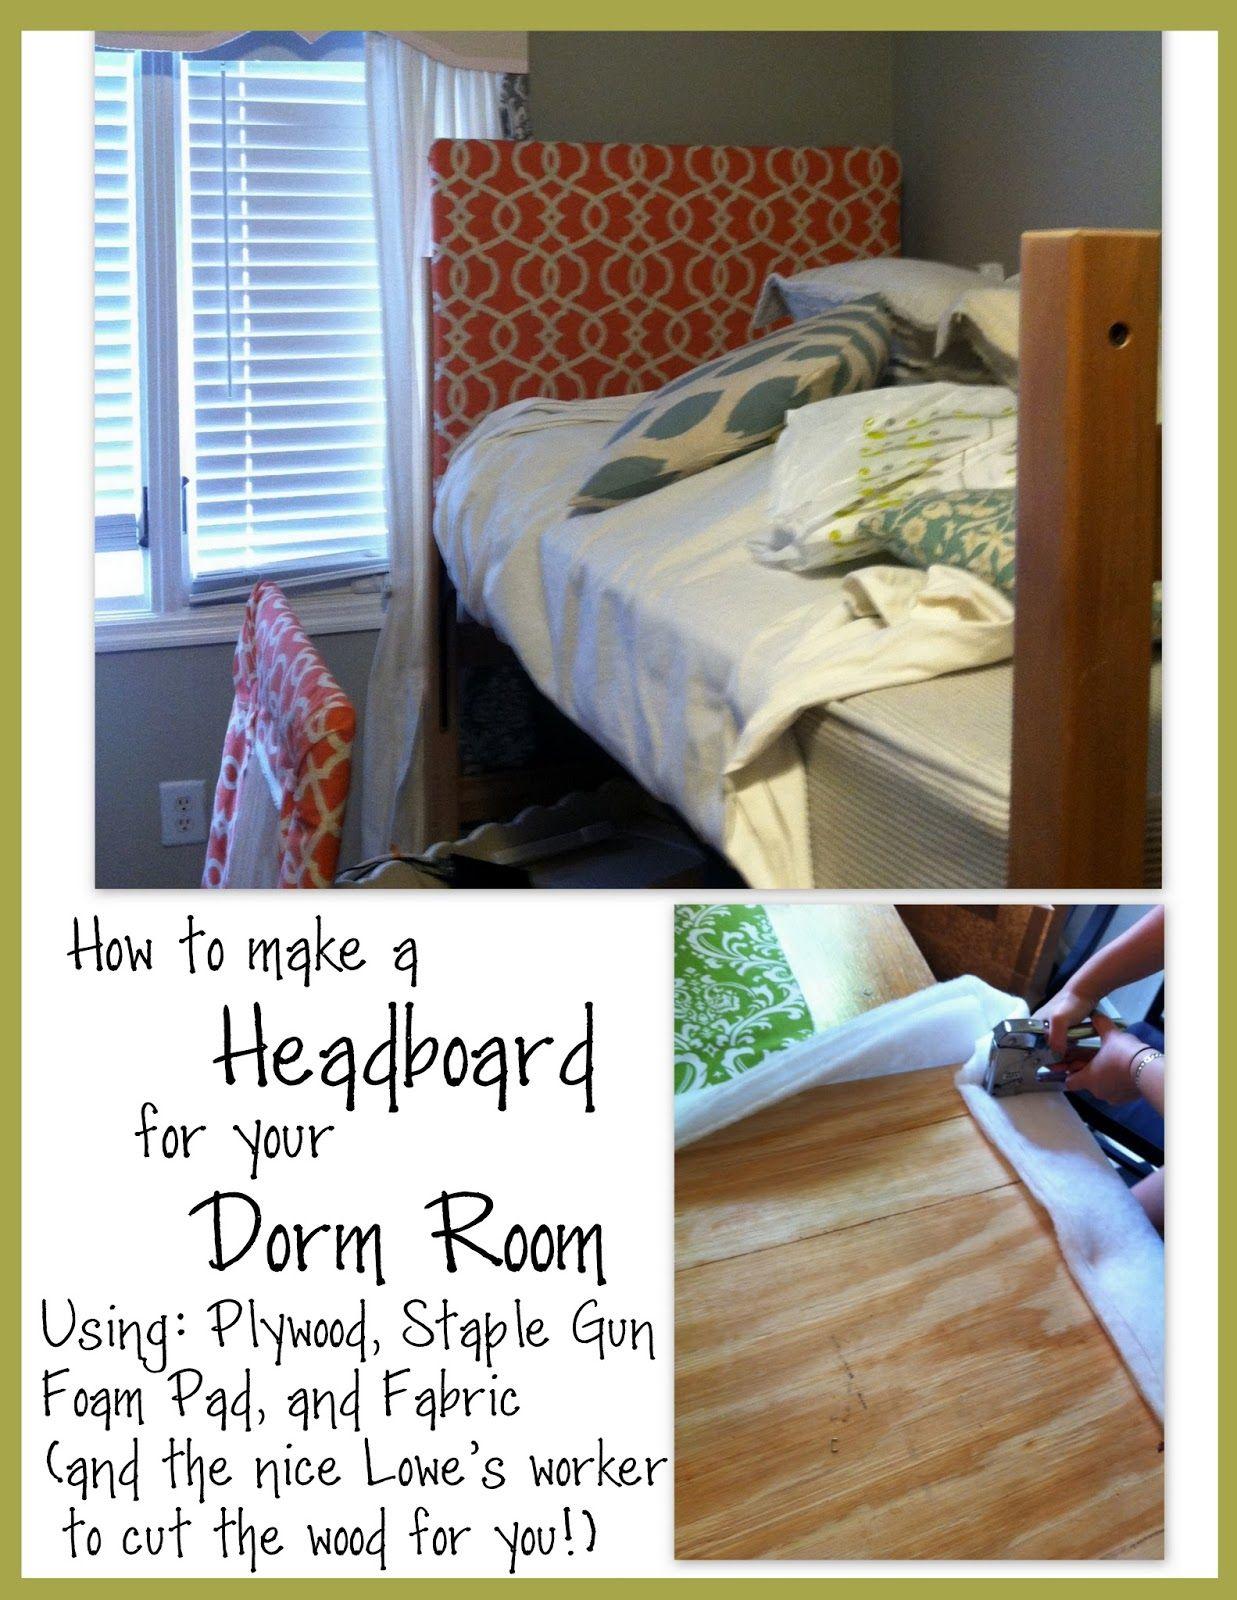 Dorm Room Headboards: Dorm Headboard Tutorial (With Images)